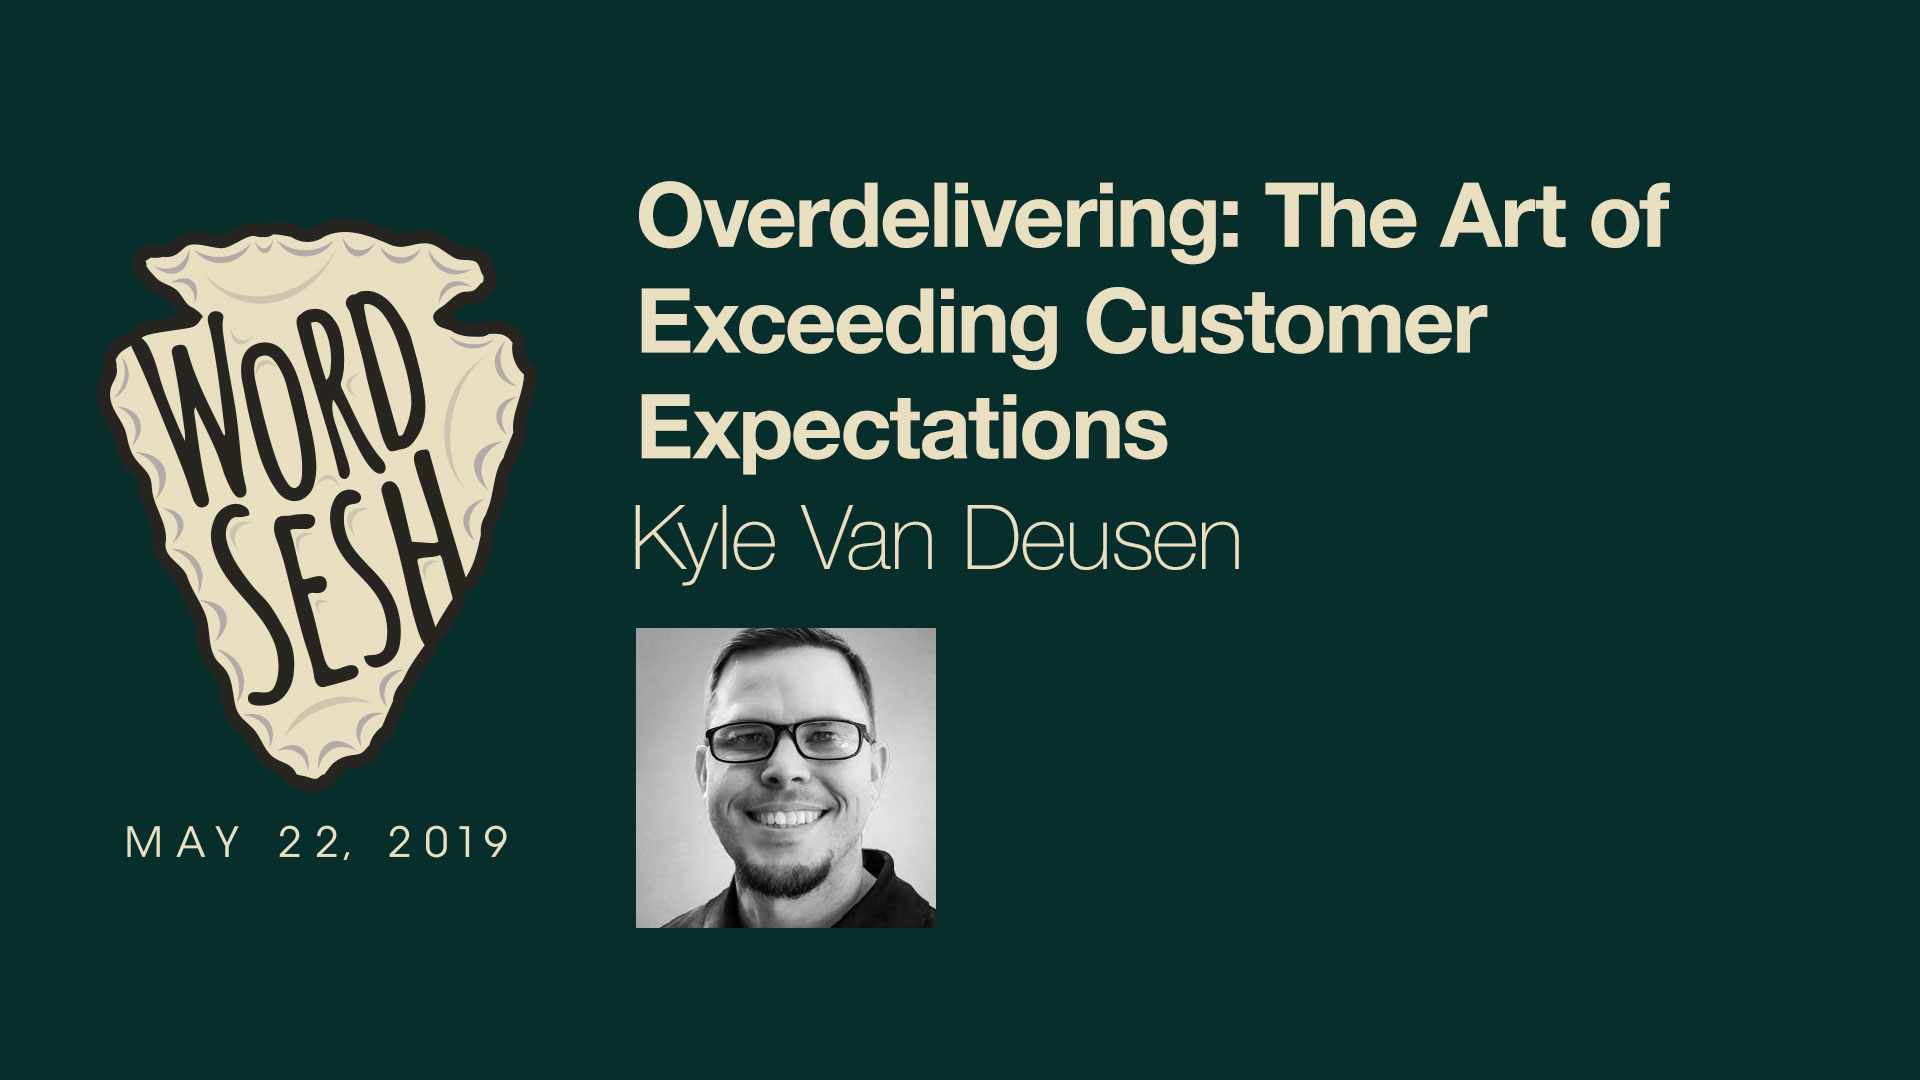 00-02-WordSesh-Overdelivering-Kyle-Van-Deusen